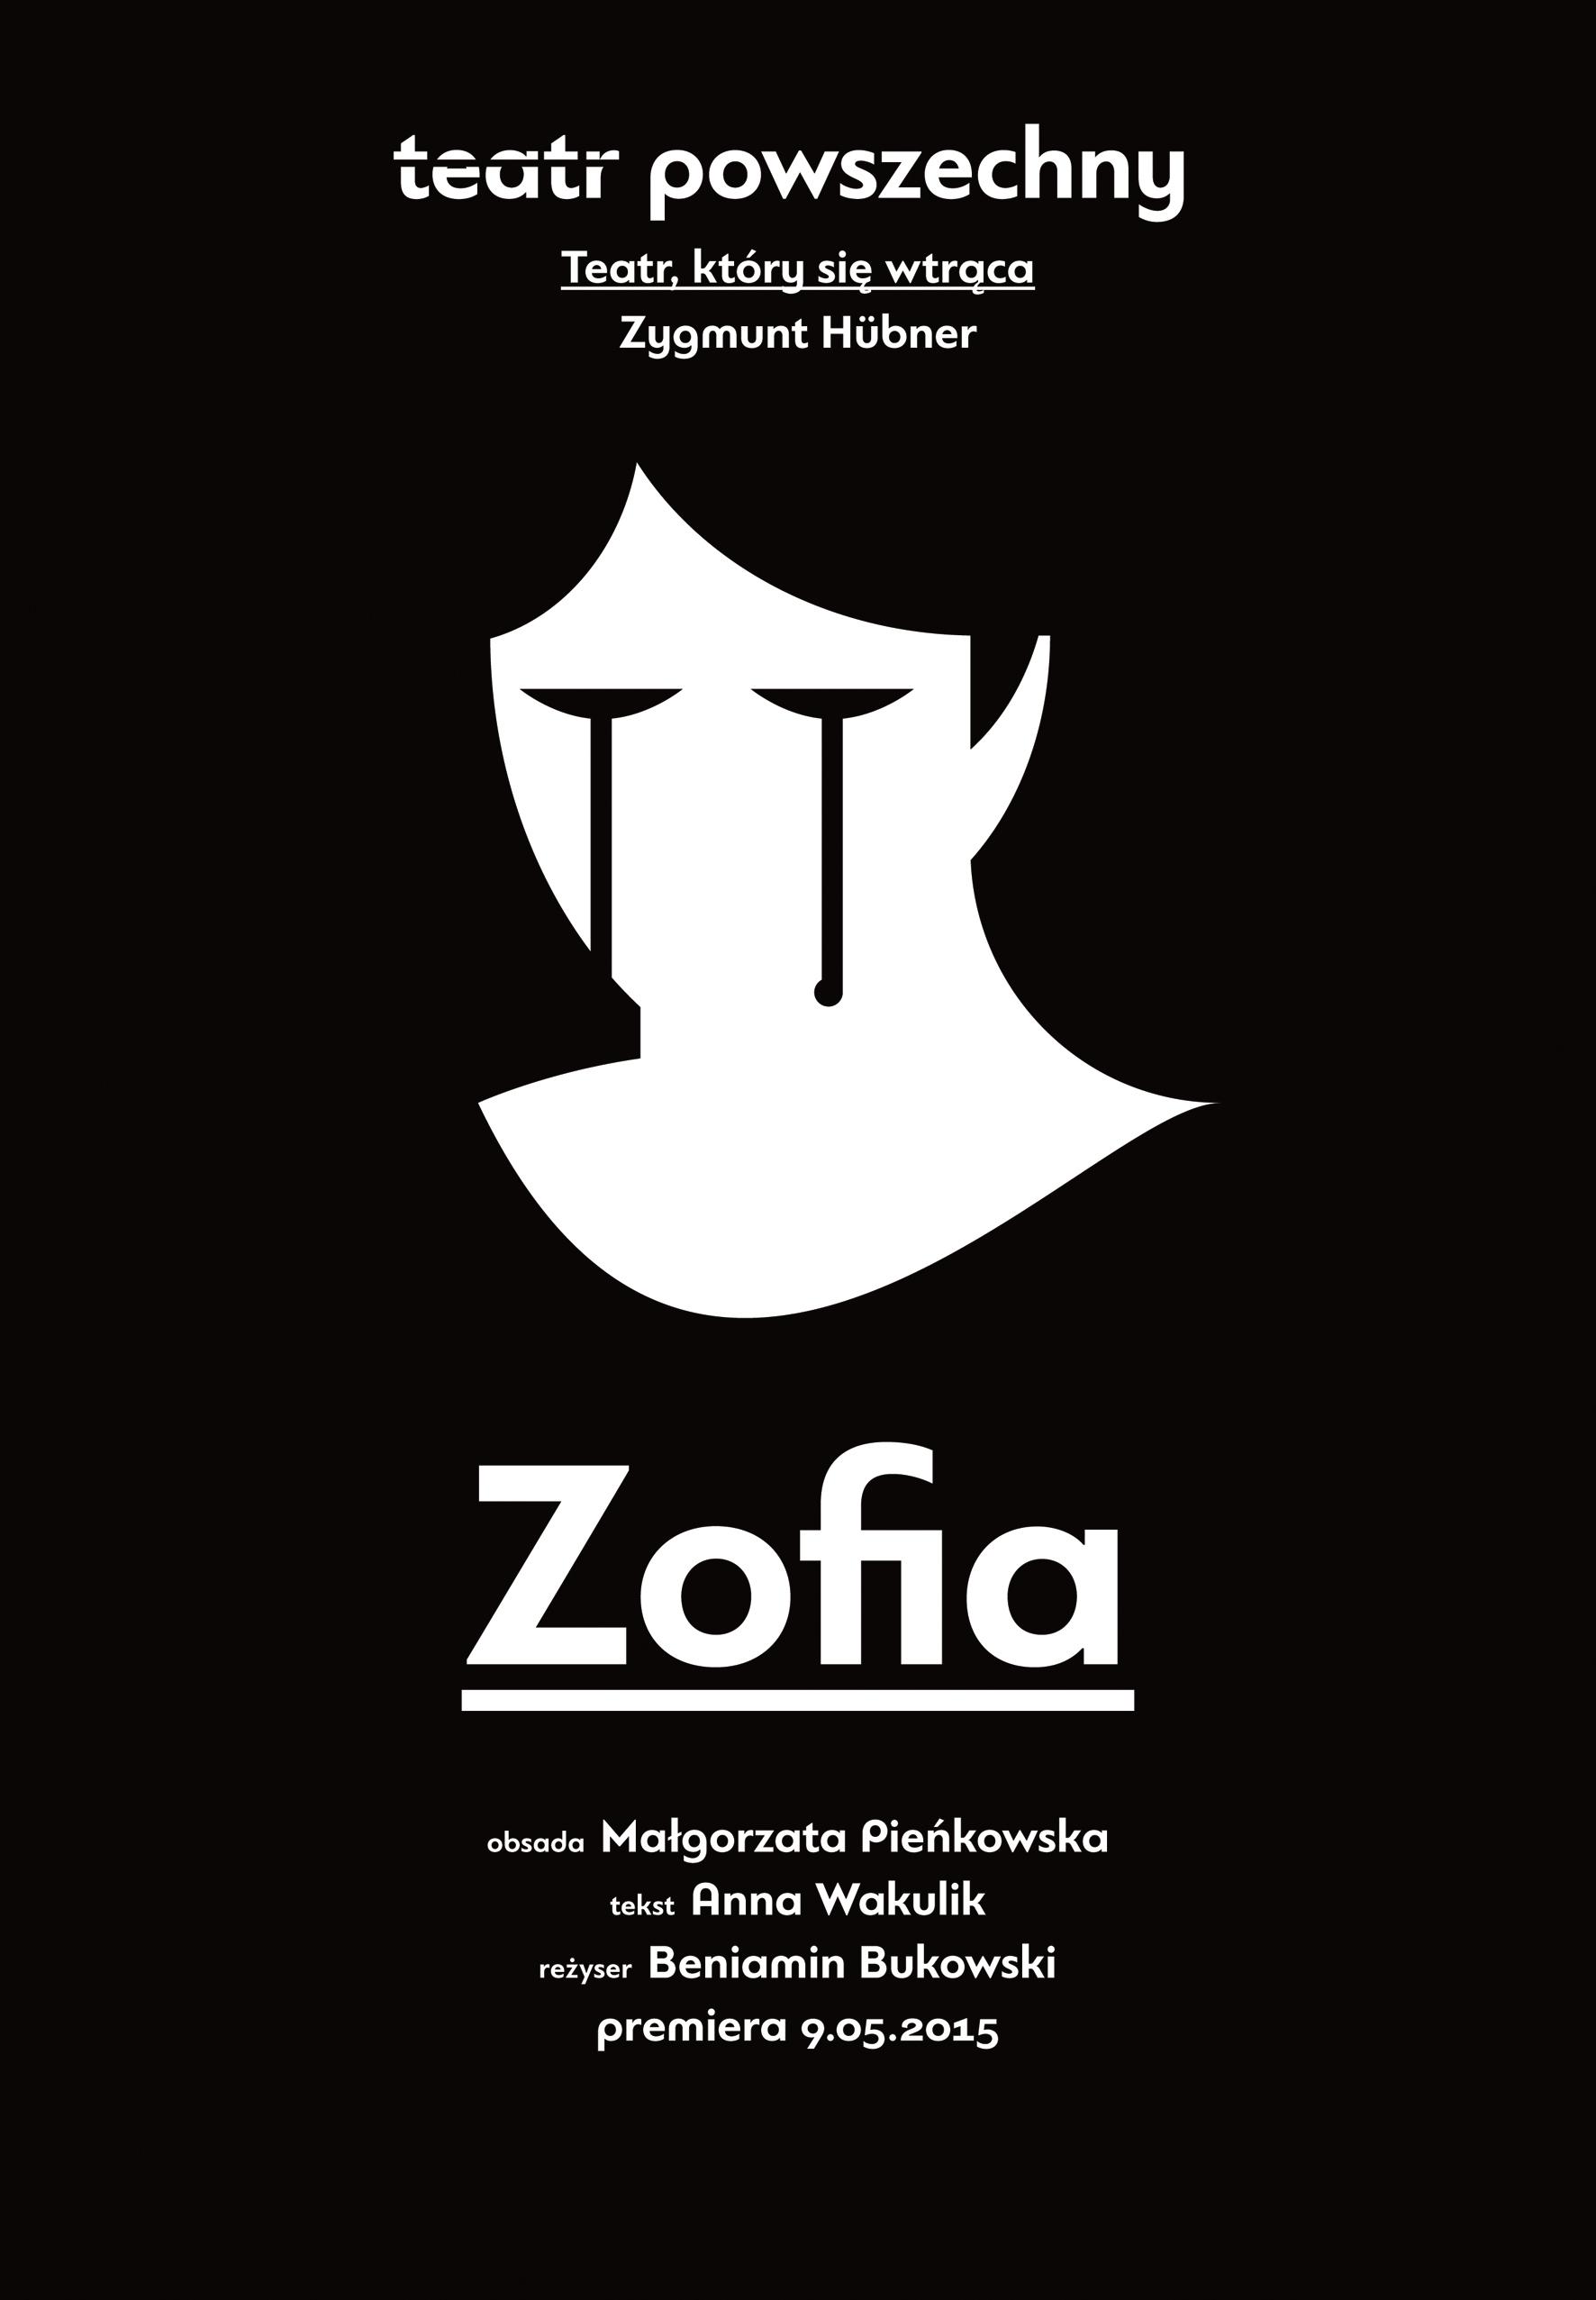 Eye On Poland Polish Graphic Design Exhibition Comes To